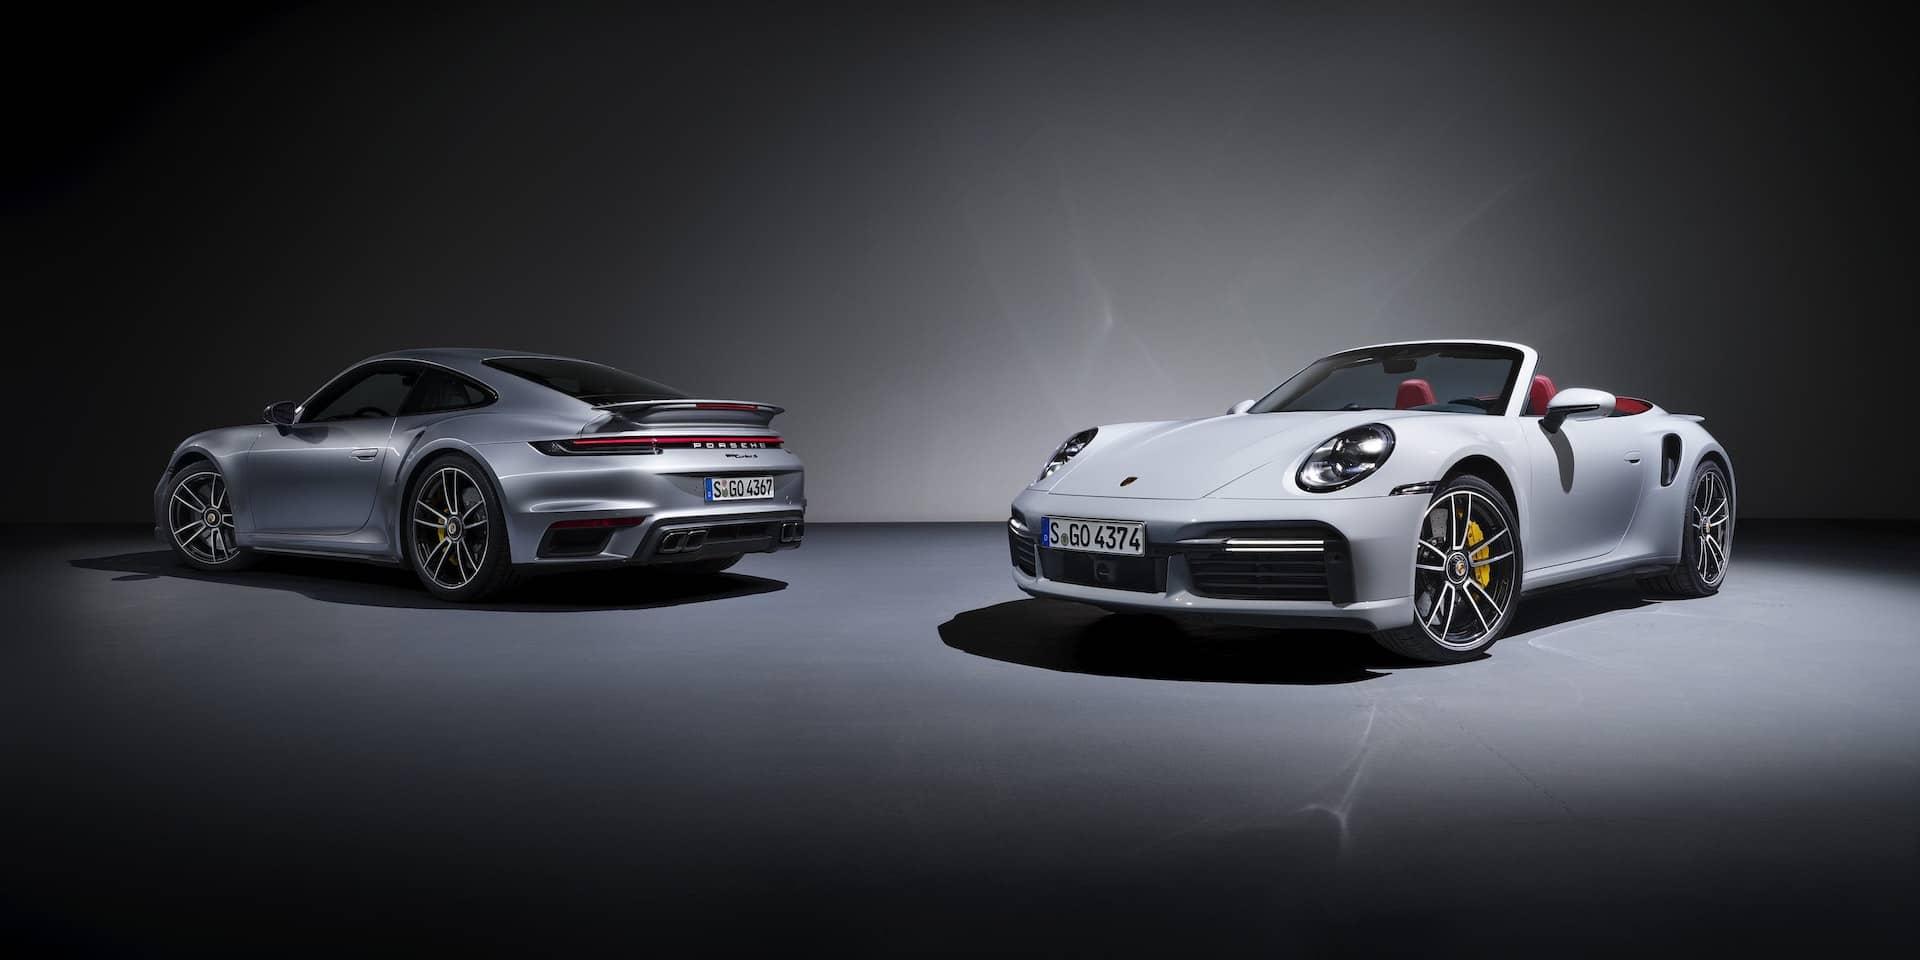 992 Porsche 911 Turbo S